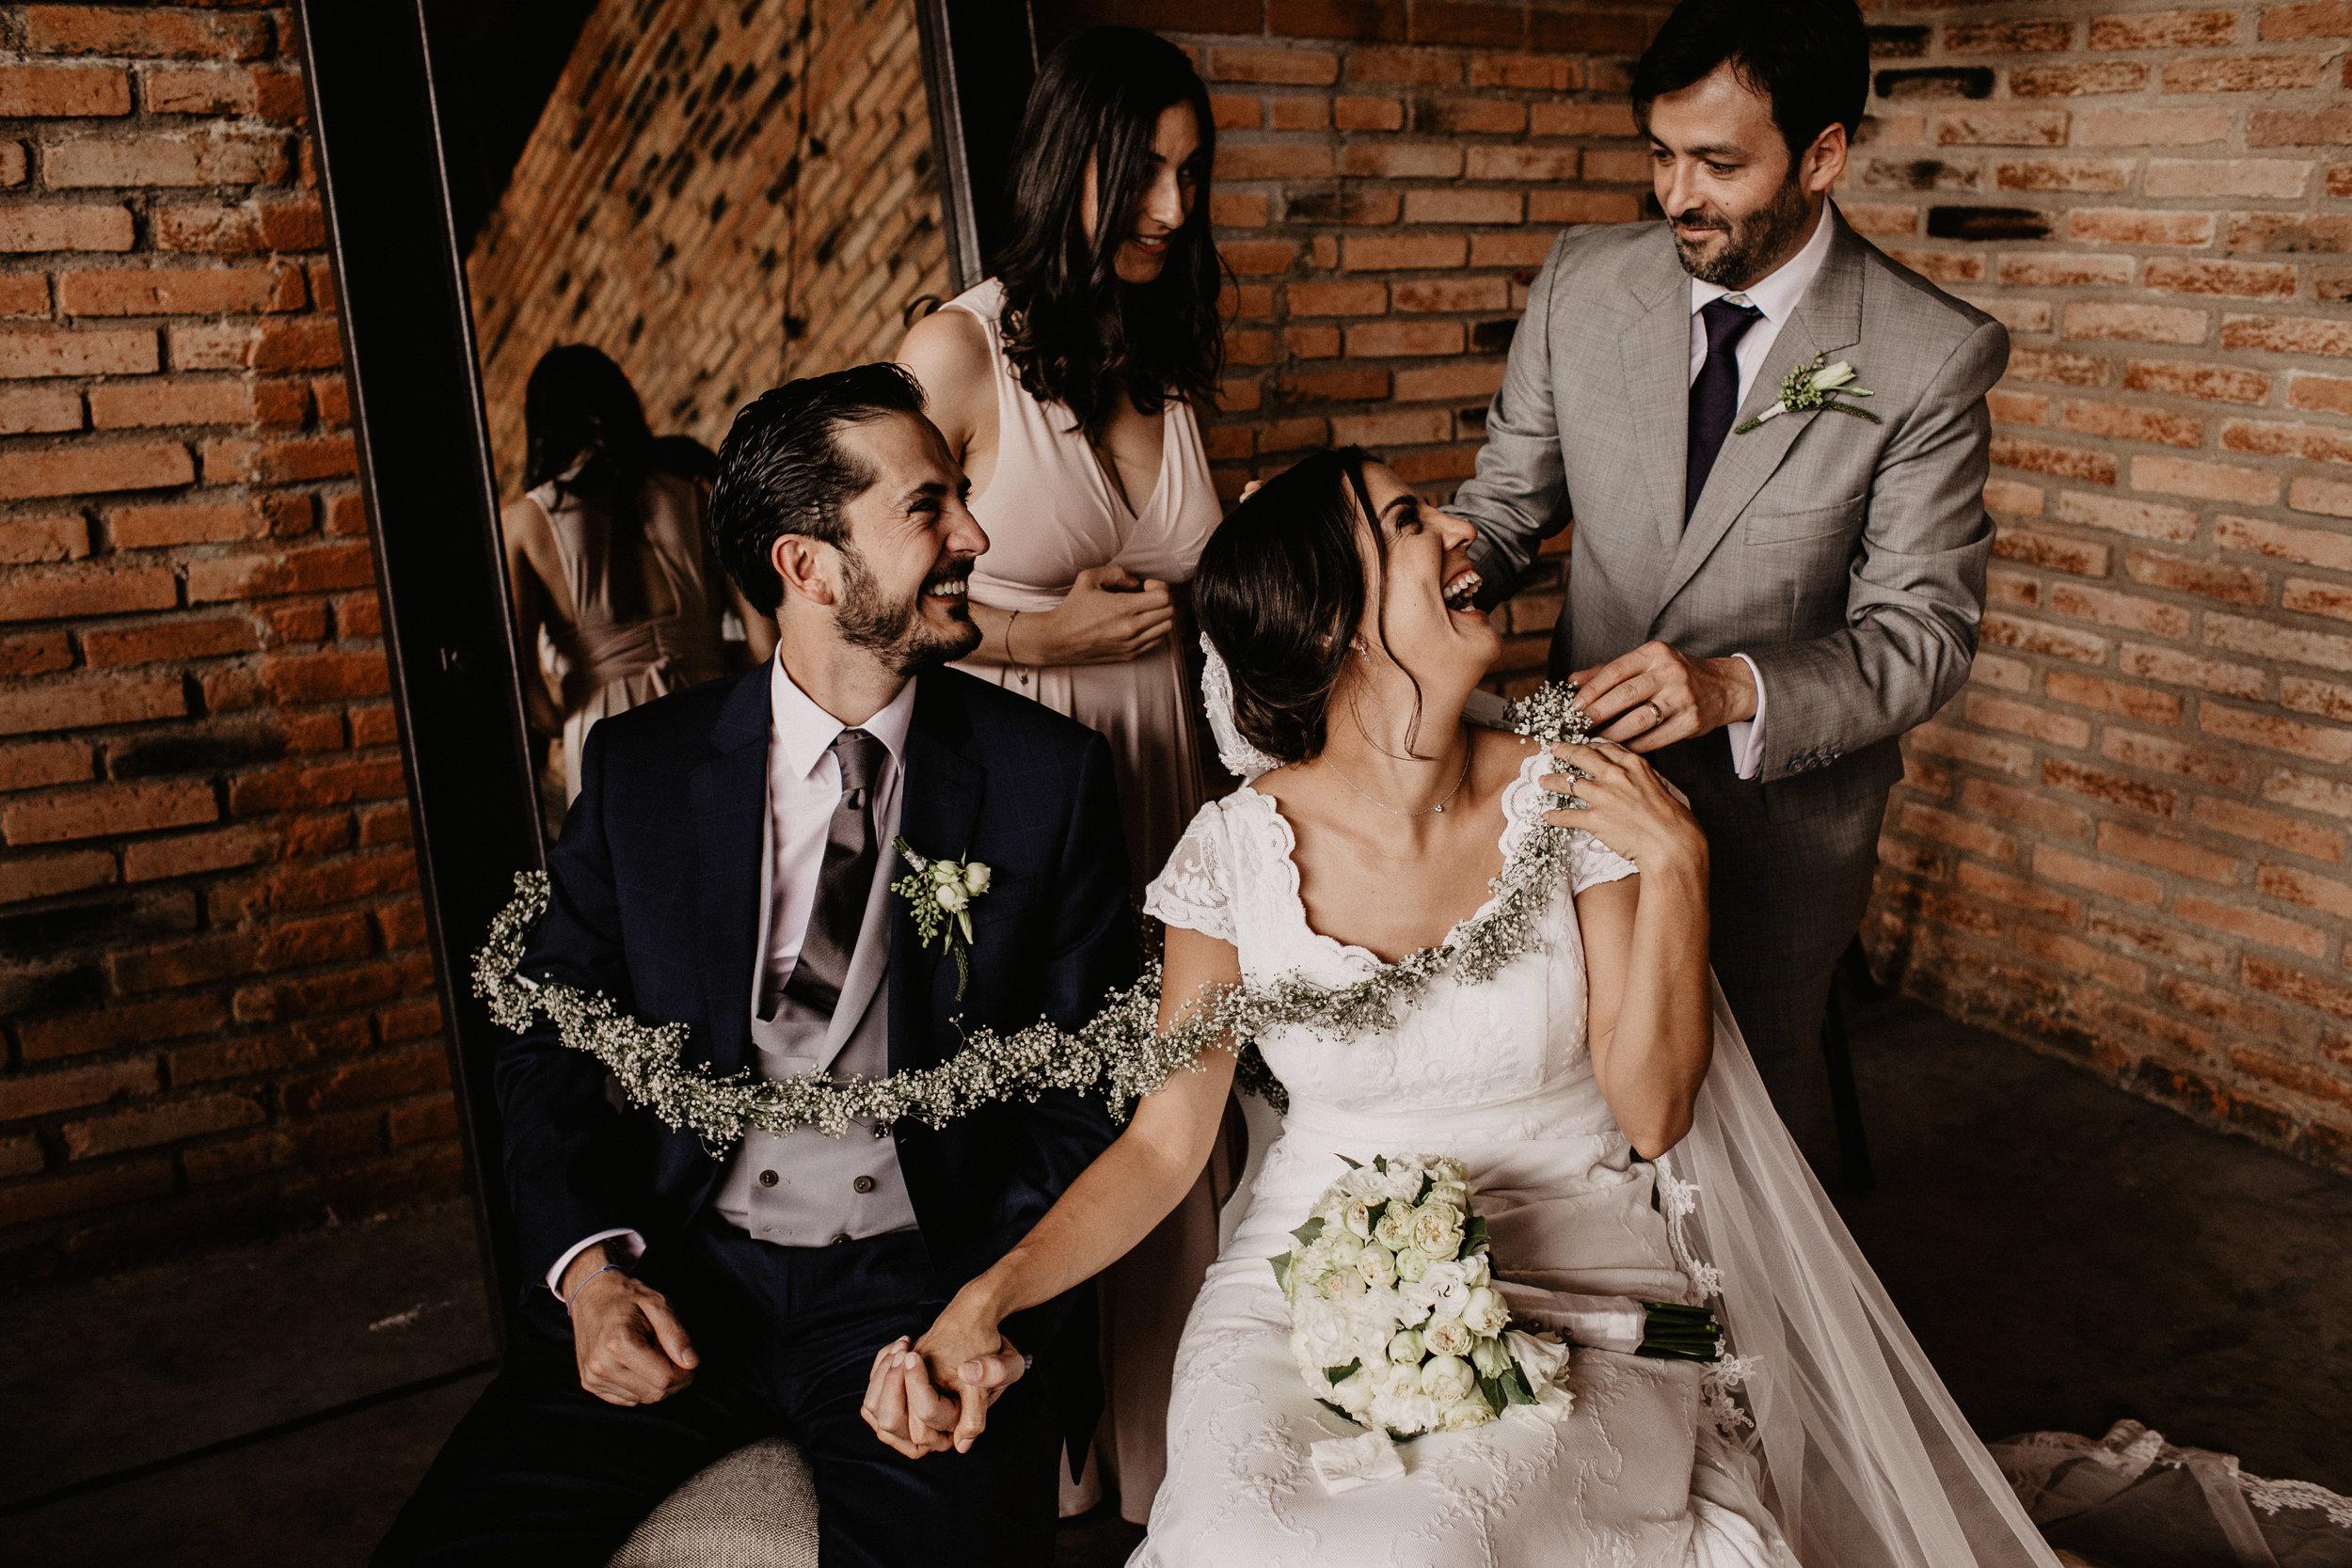 alfonso_flores_destination_wedding_photographer_pau_alonso_479.JPG